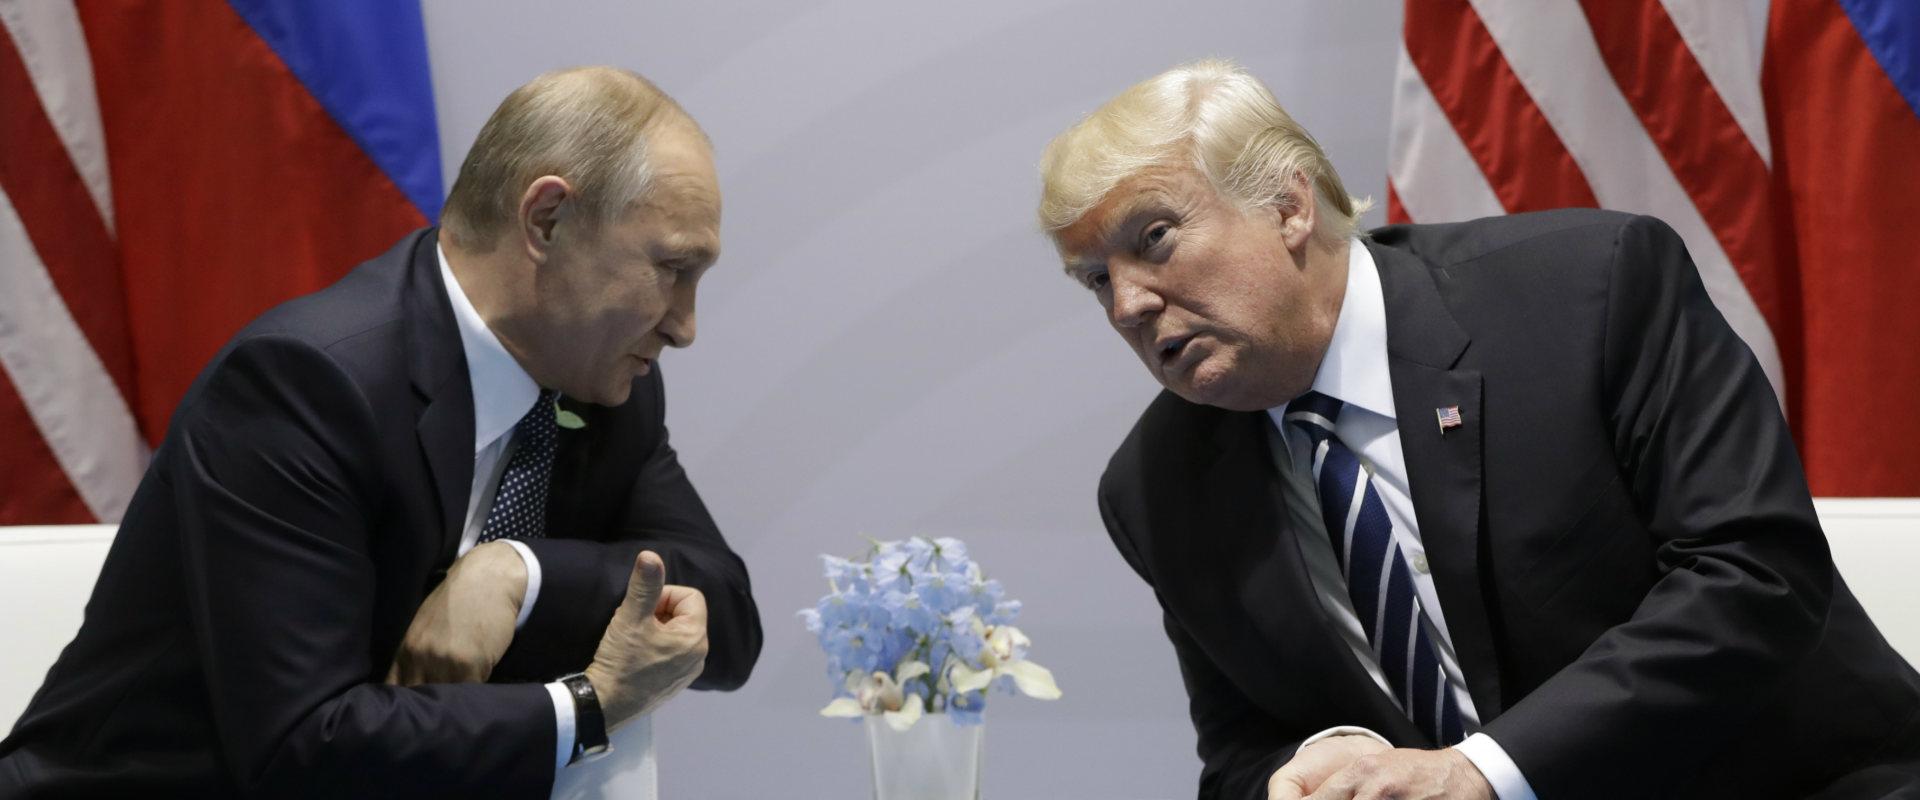 מימין: נשיא ארצות הברית טראמפ ונשיא רוסיה פוטין